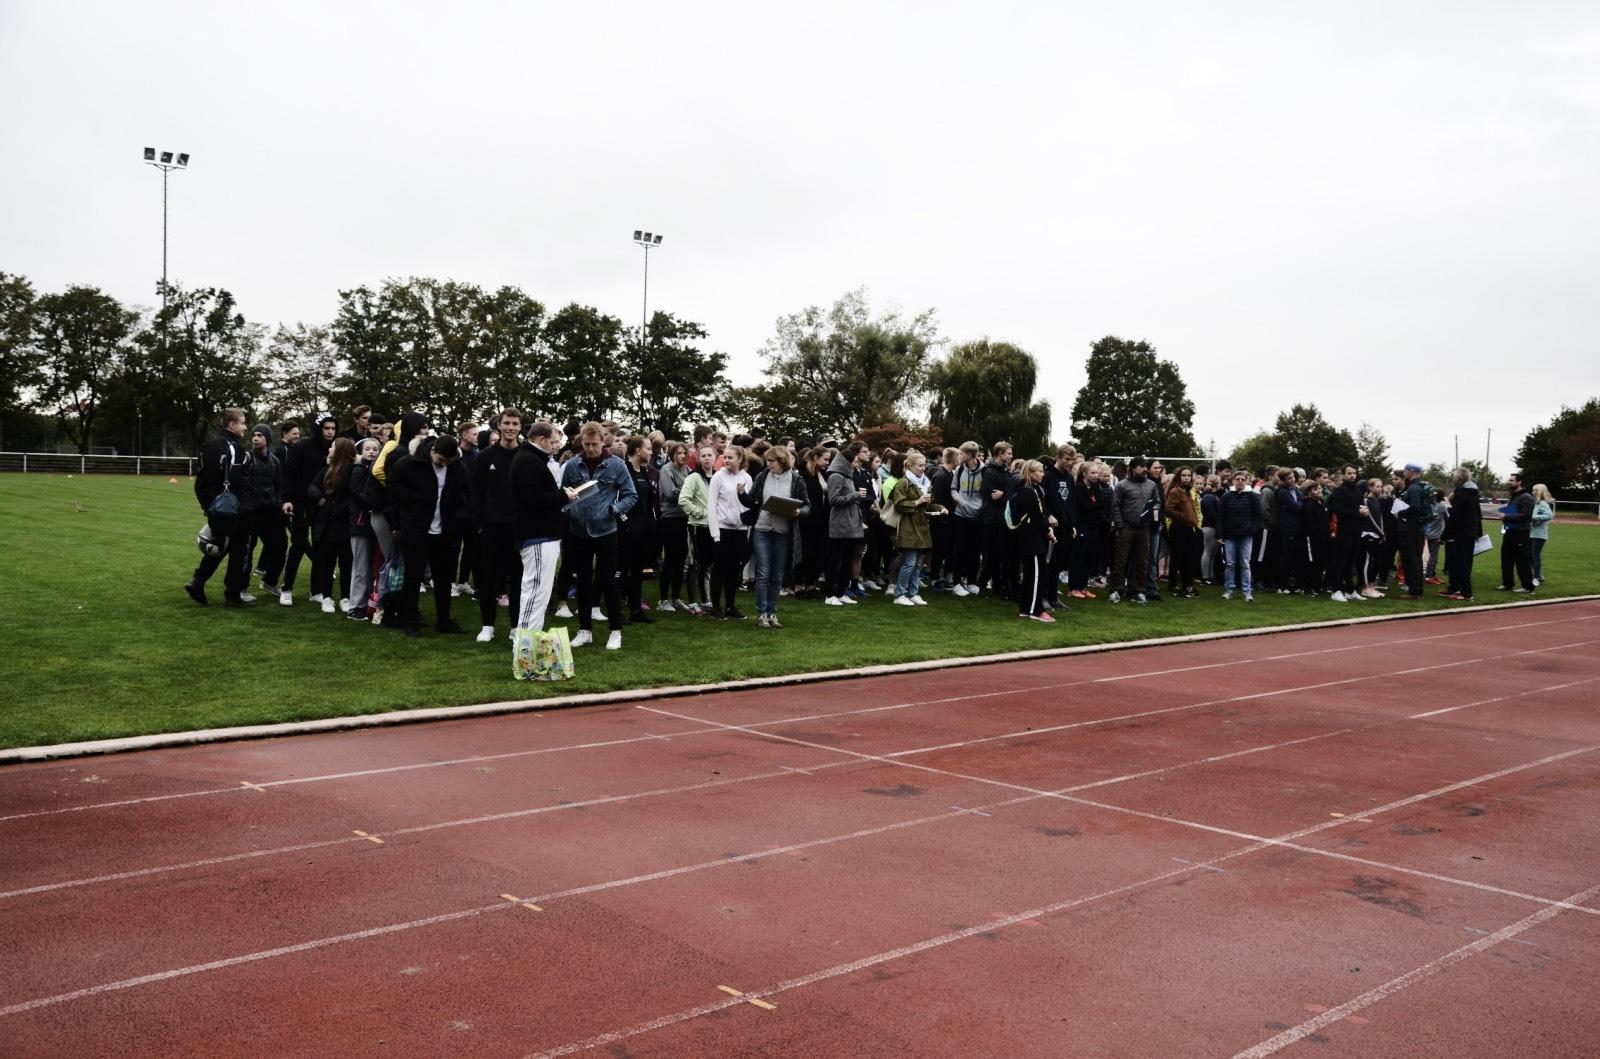 hsg-sportfest-2019-02